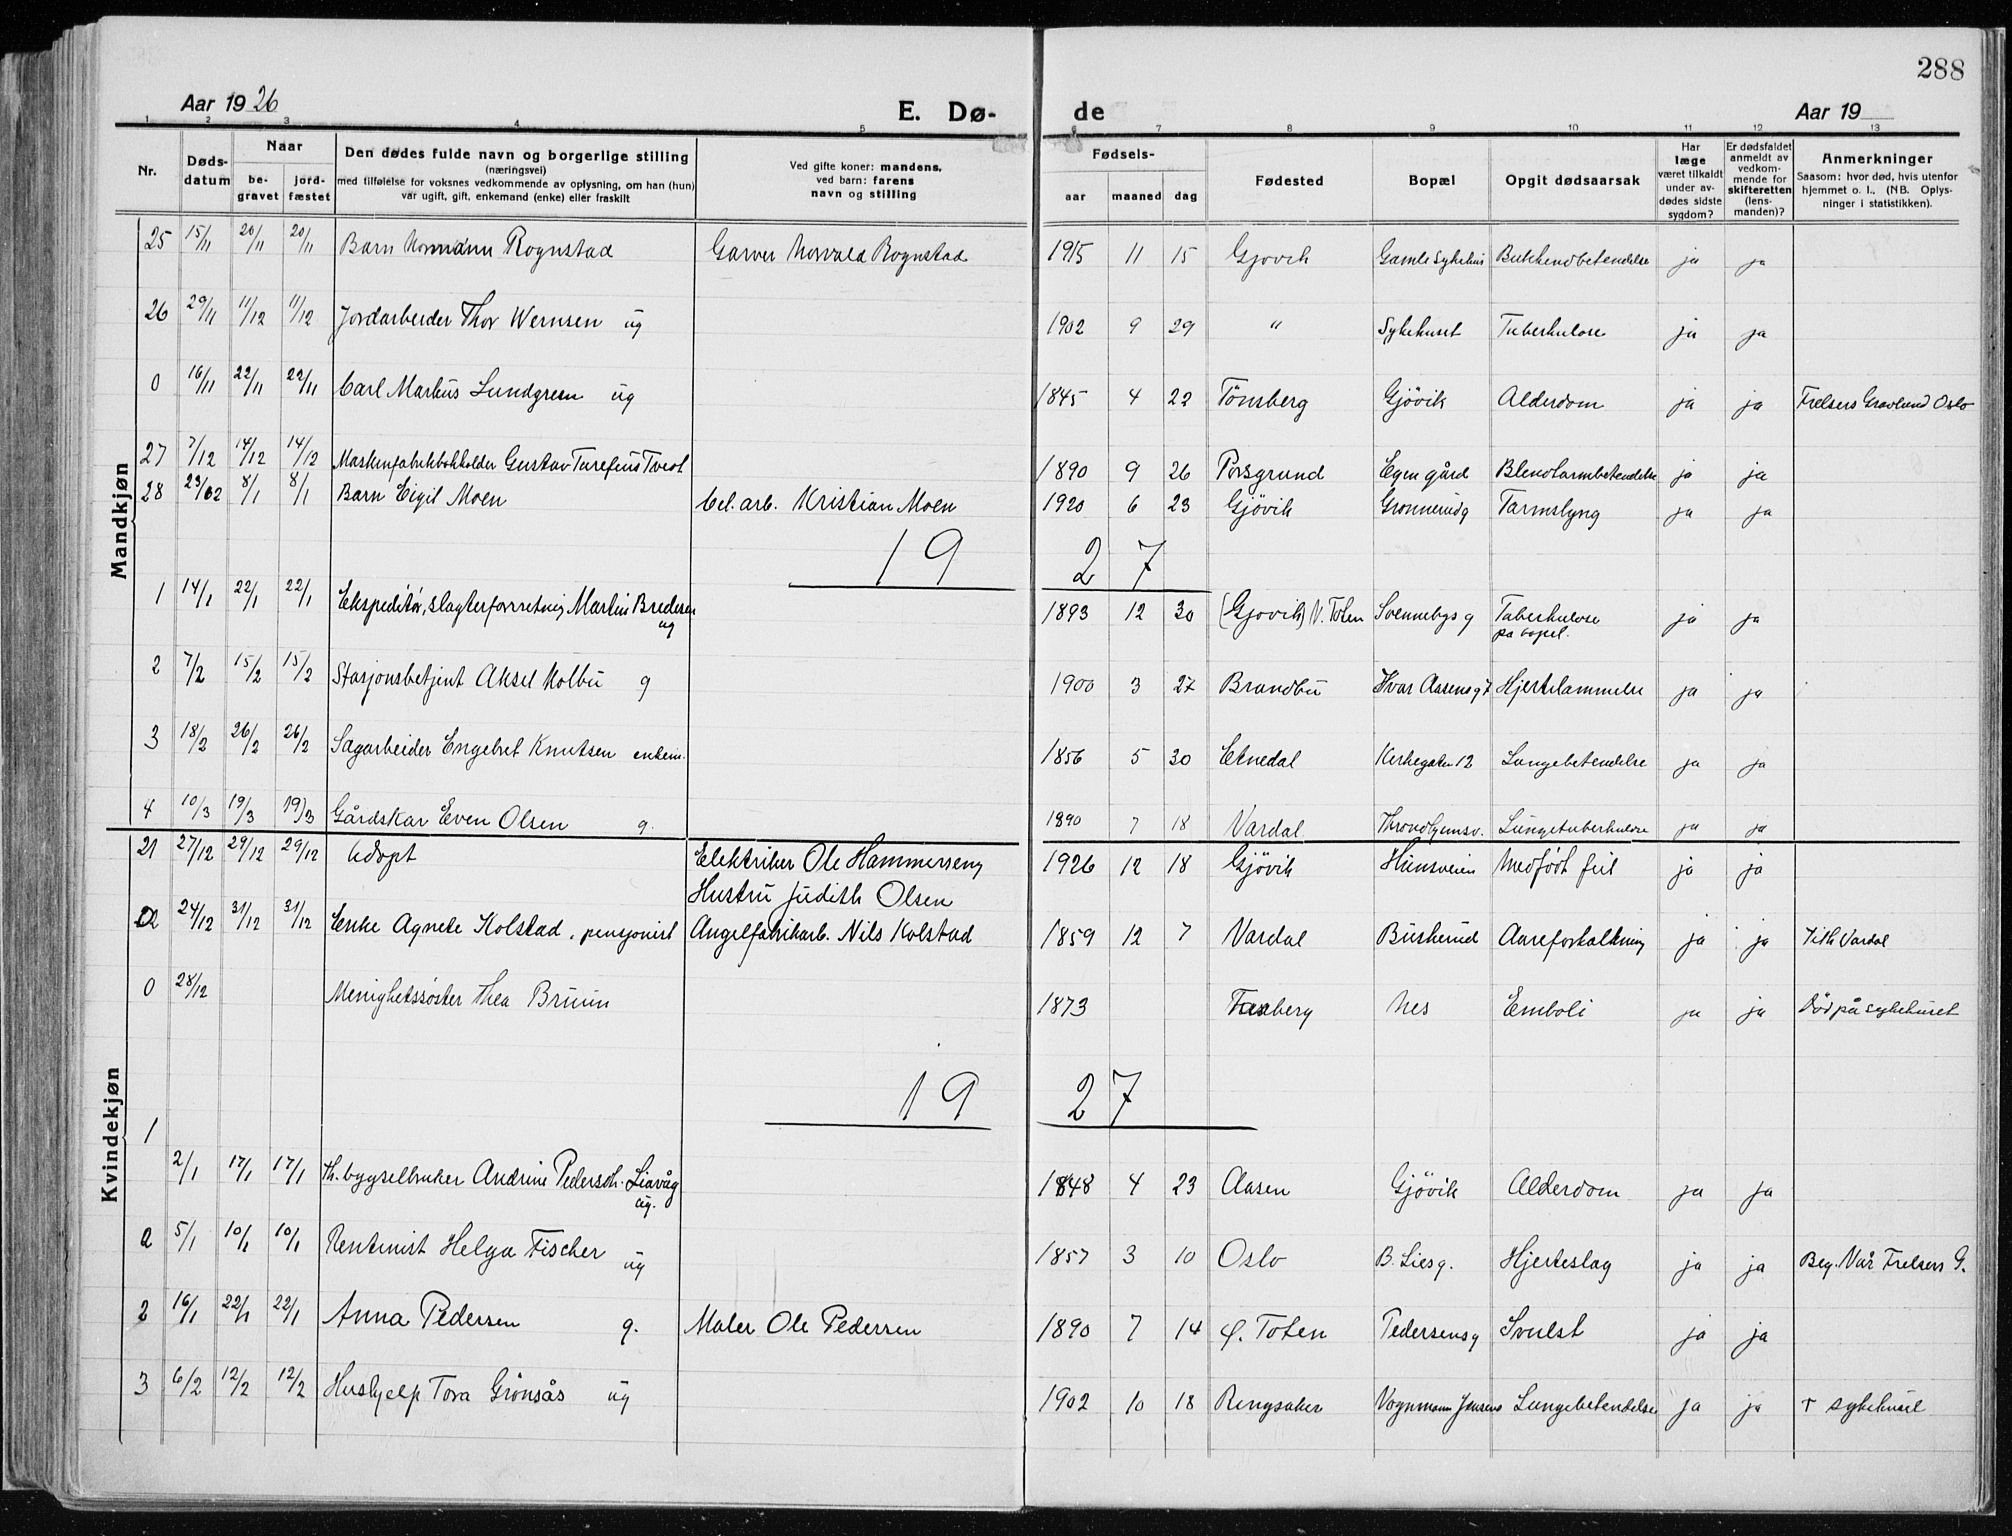 SAH, Vardal prestekontor, H/Ha/Haa/L0015: Ministerialbok nr. 15, 1923-1937, s. 288